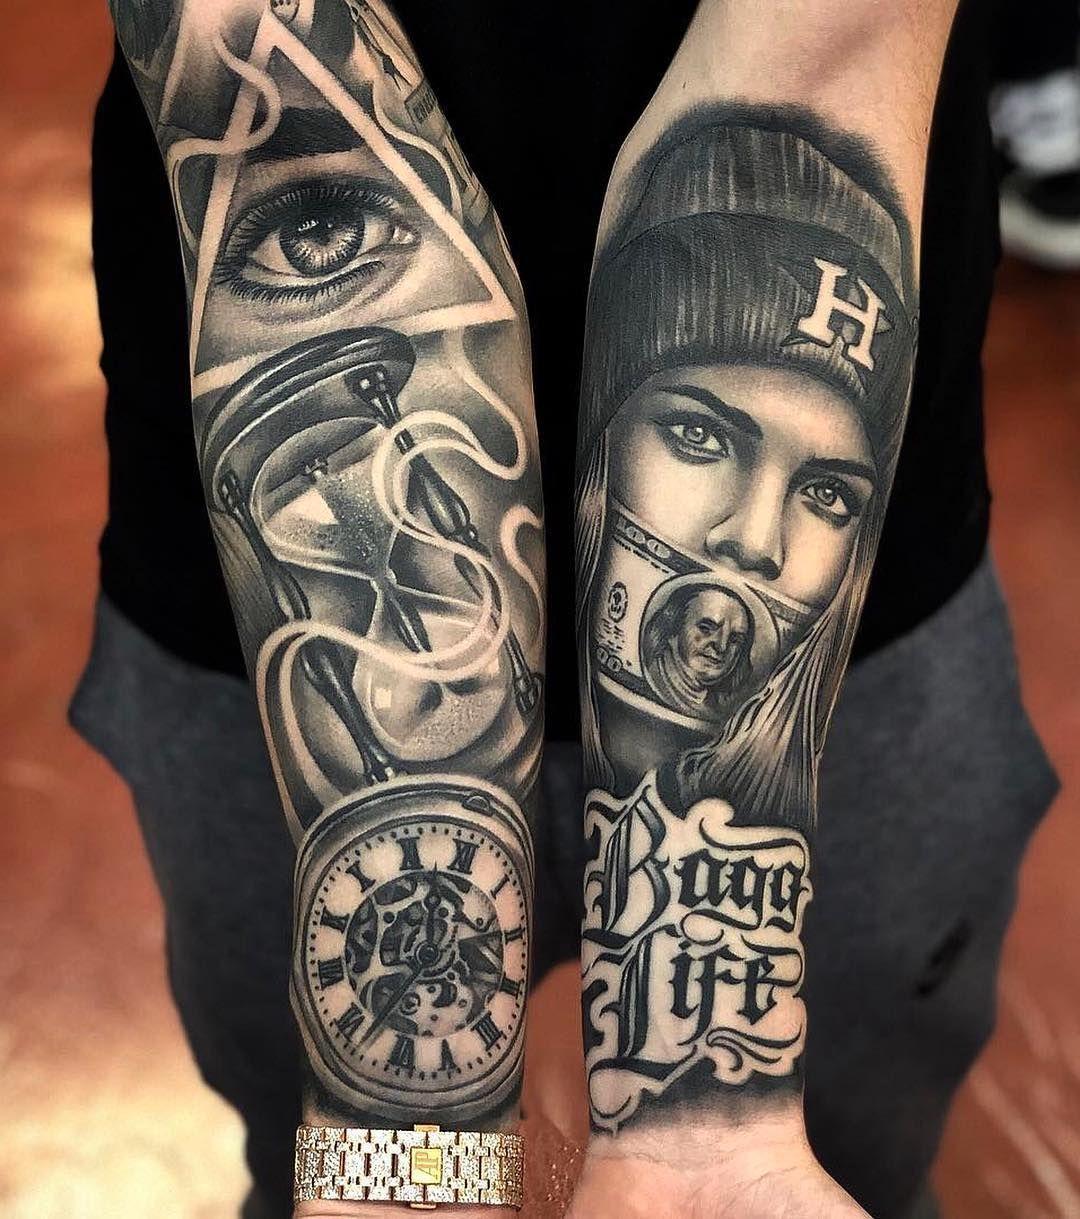 Best Tattoo Artist On Instagram Repost Best Tattoo Styles Artist Ebone Capone Tattoos Tattoo Artists Gangsta Tattoos Fine line tattoos, watercolor tattoos, geometric tattoos are a great place to start. repost best tattoo styles